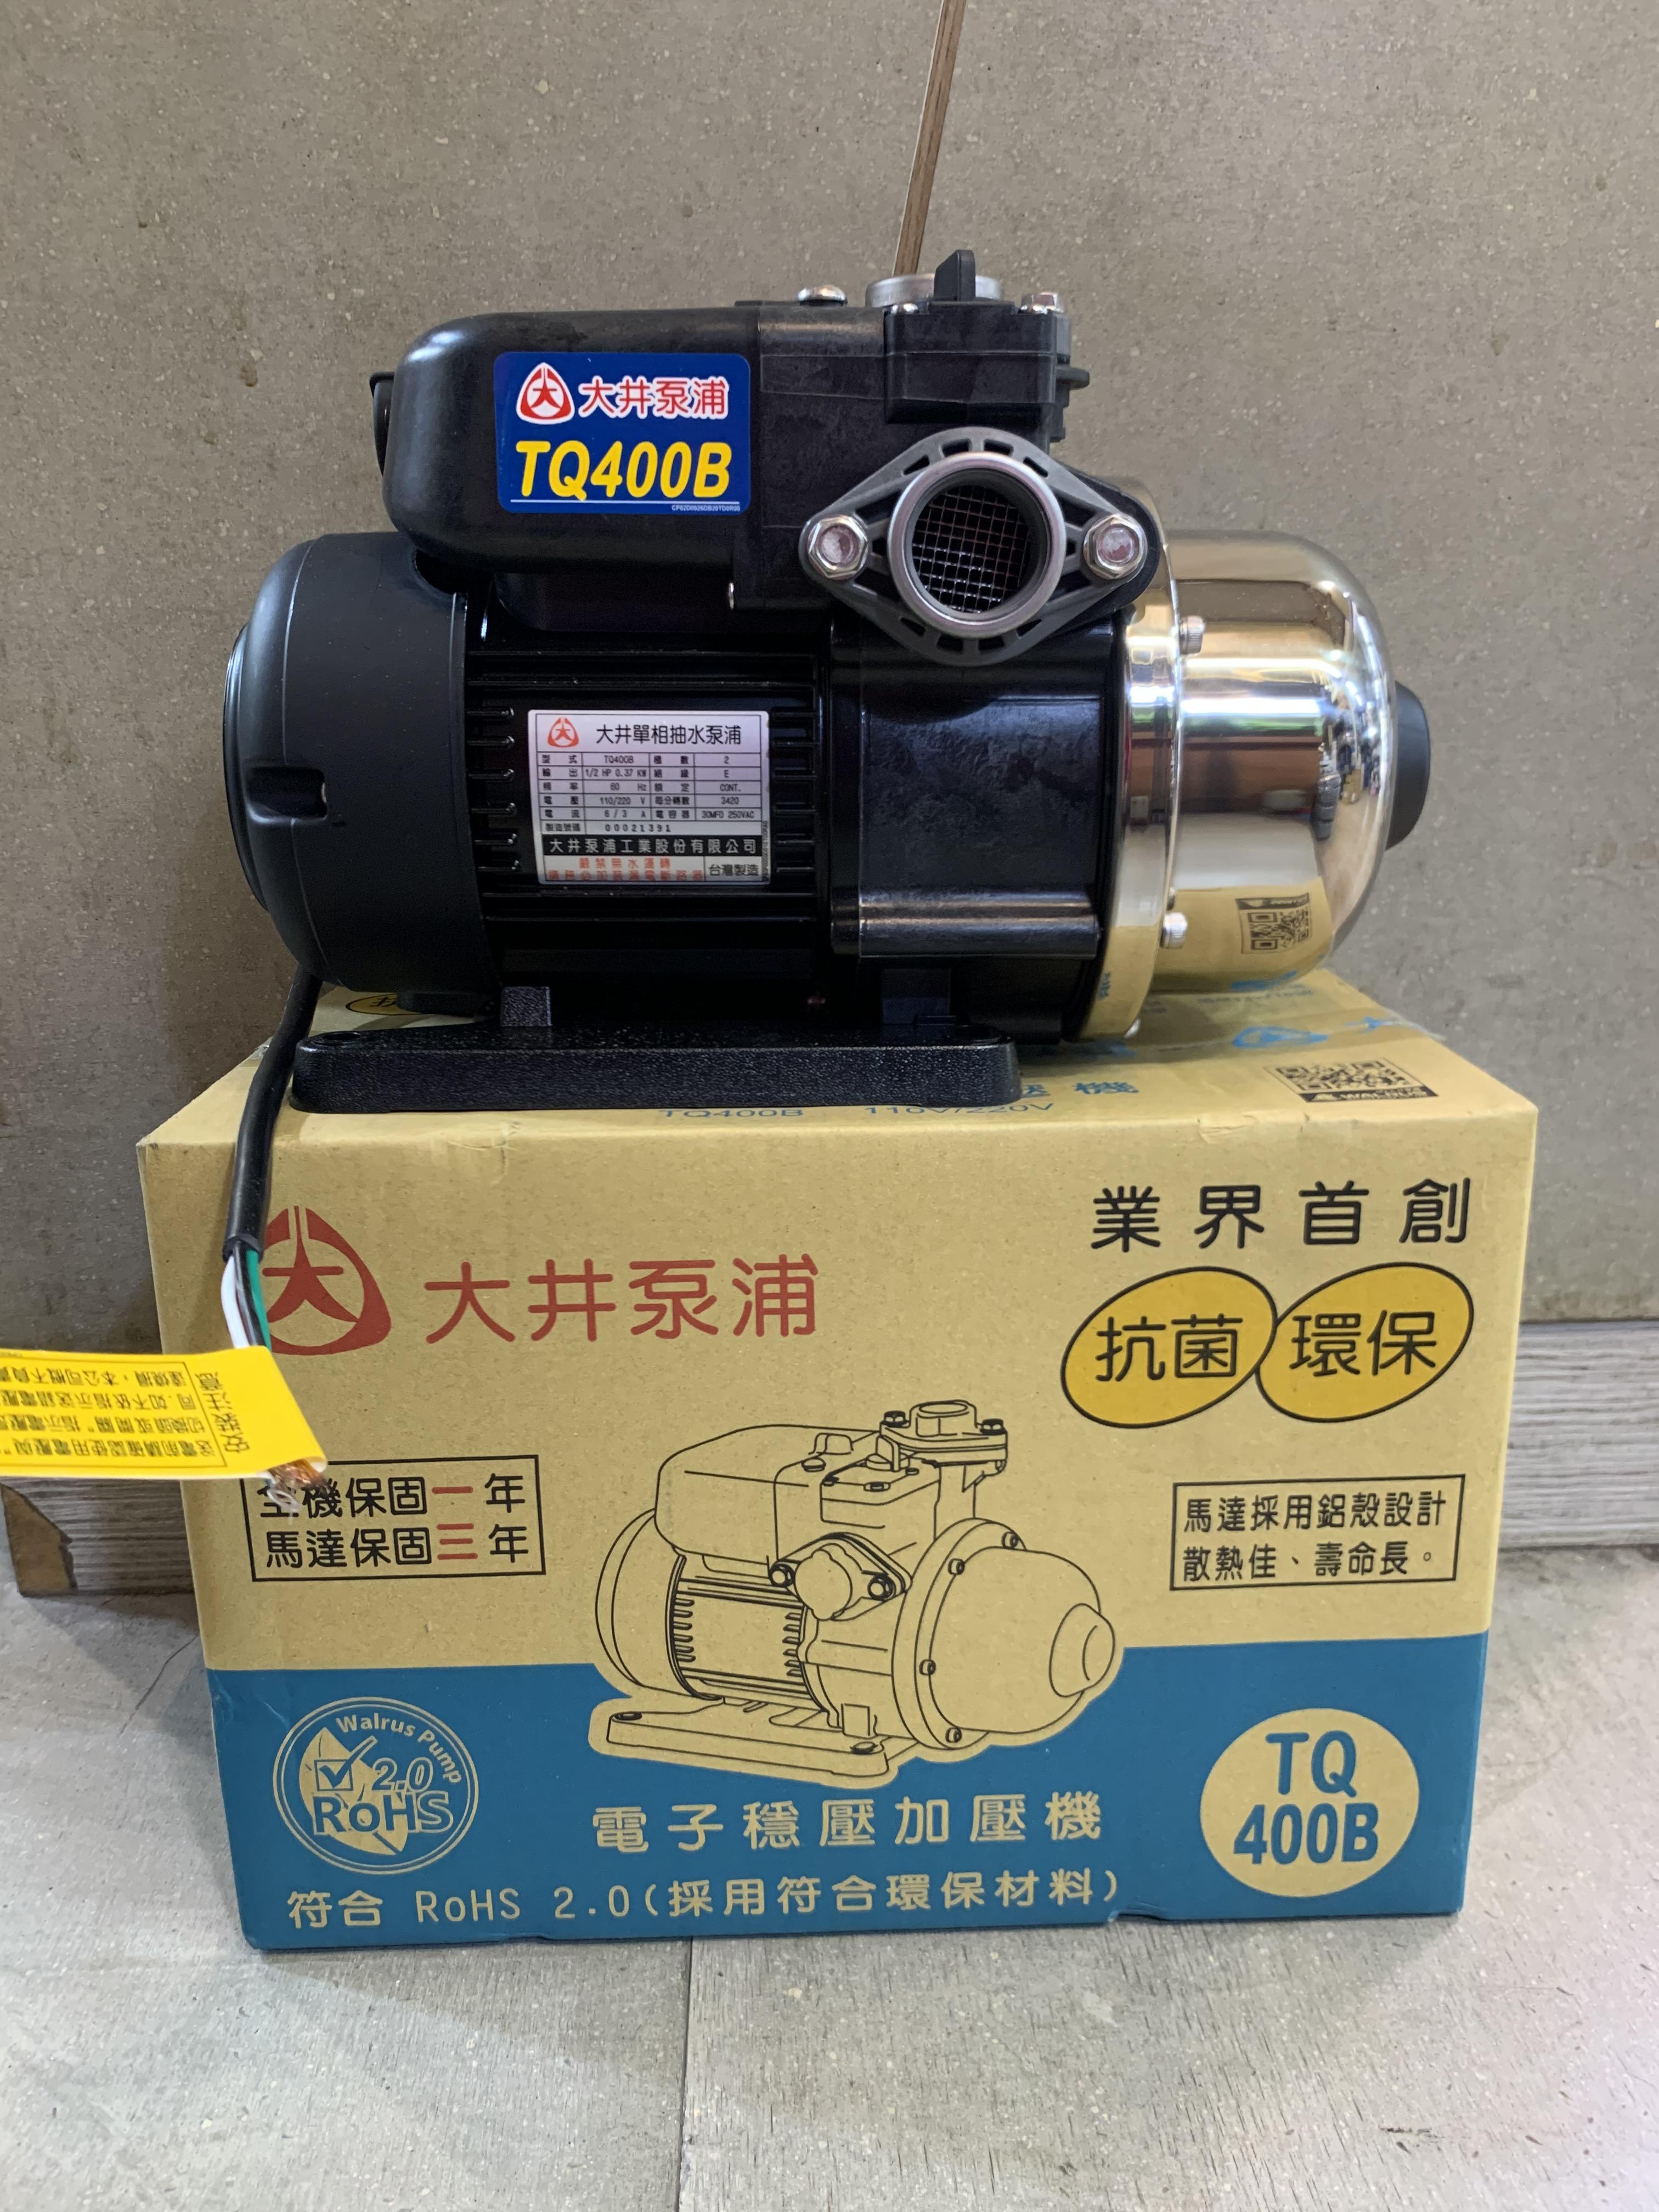 DIY水電材料 大井TQ400B-1/2HP電子穩壓加壓機/不生鏽抽水馬達/電子恆壓機